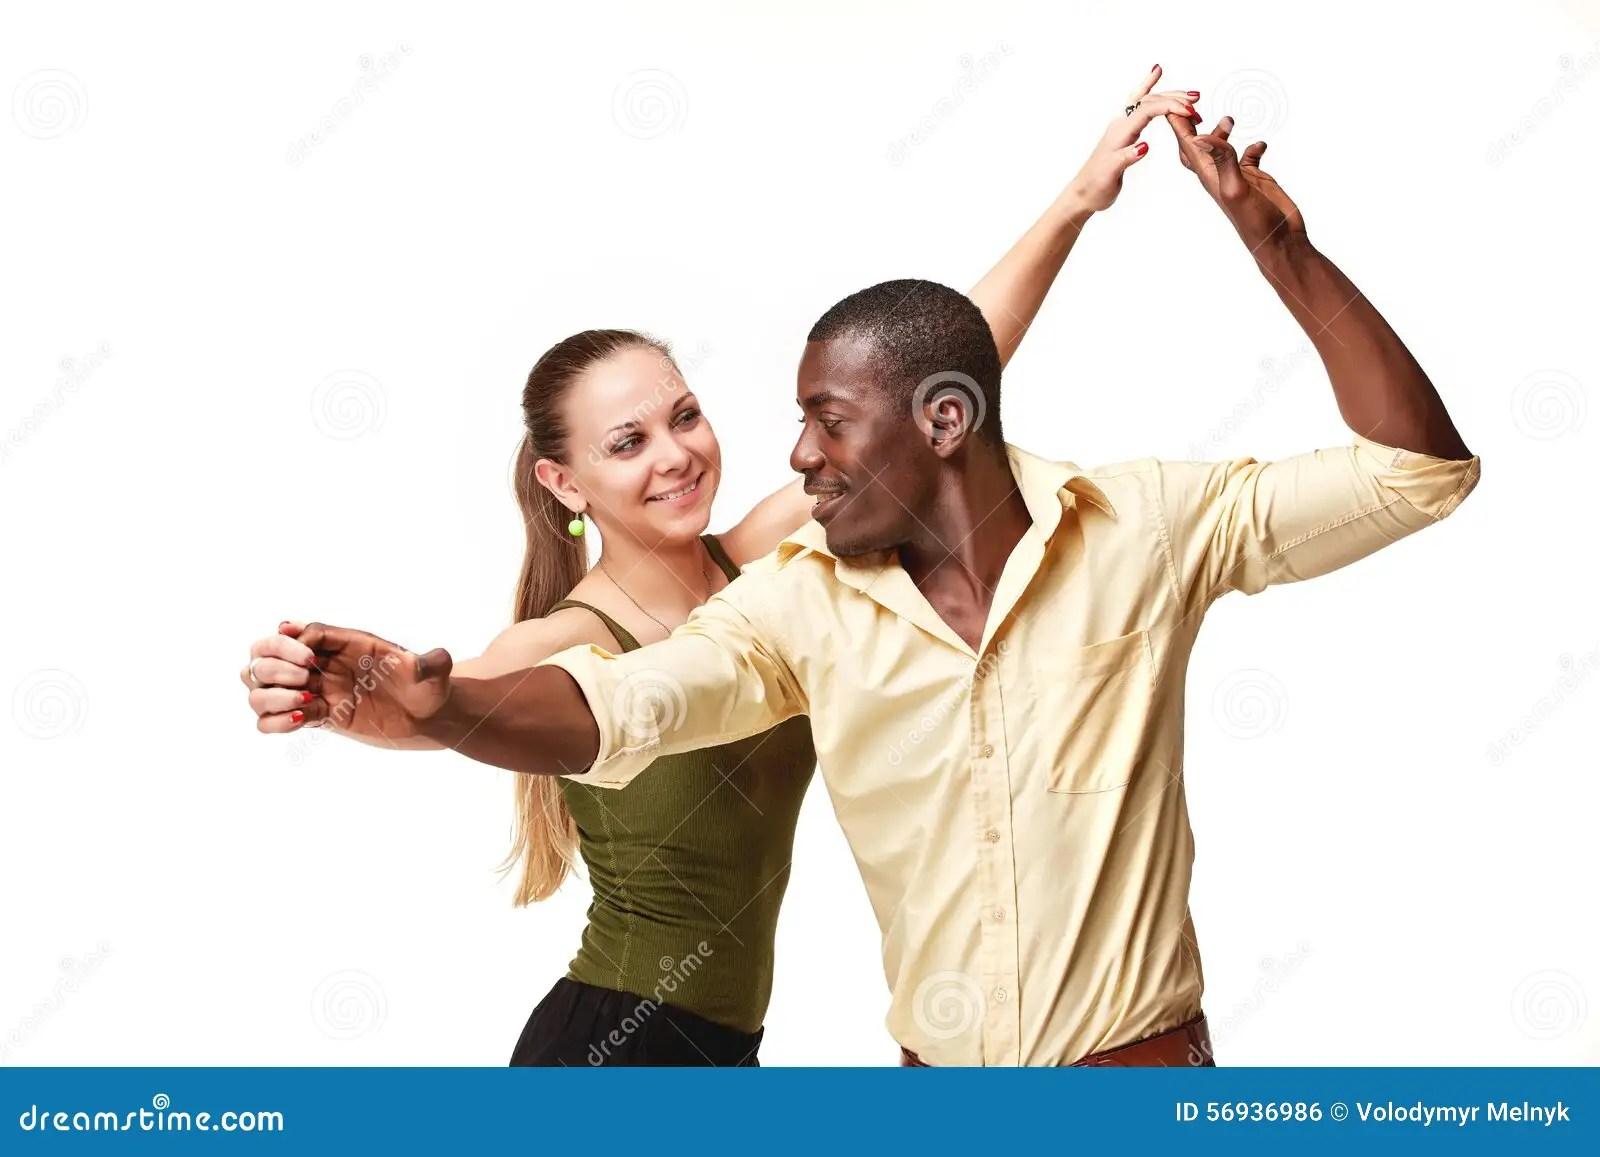 Graphics Ballroom Dancers